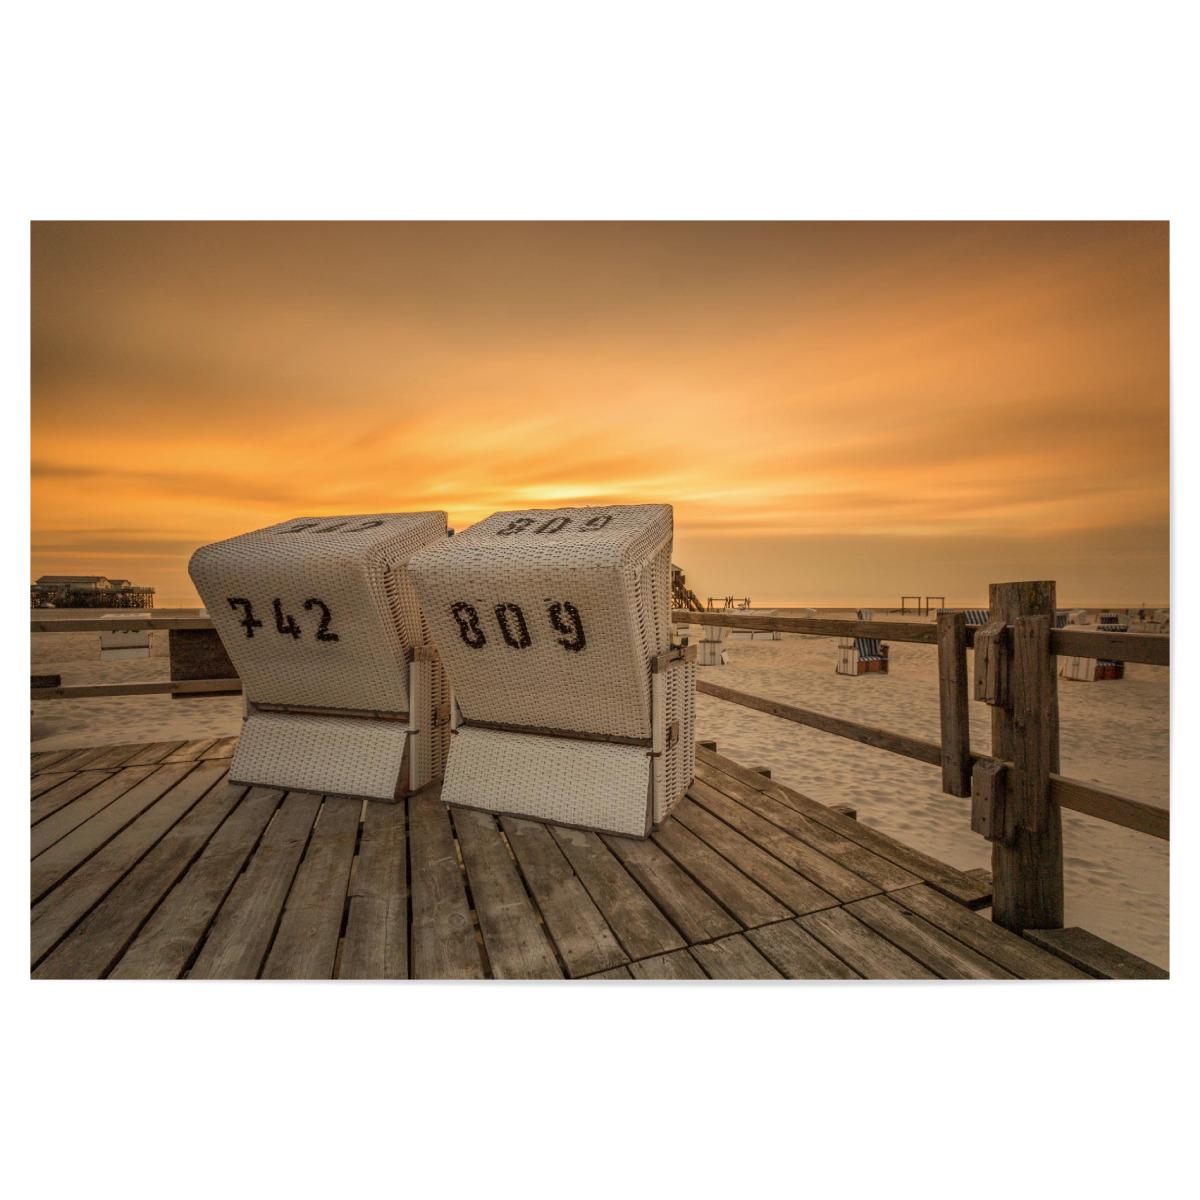 Strandkorb sonnenuntergang  Strandkorb Nordsee Sonnenuntergang als Poster bei artboxONE kaufen